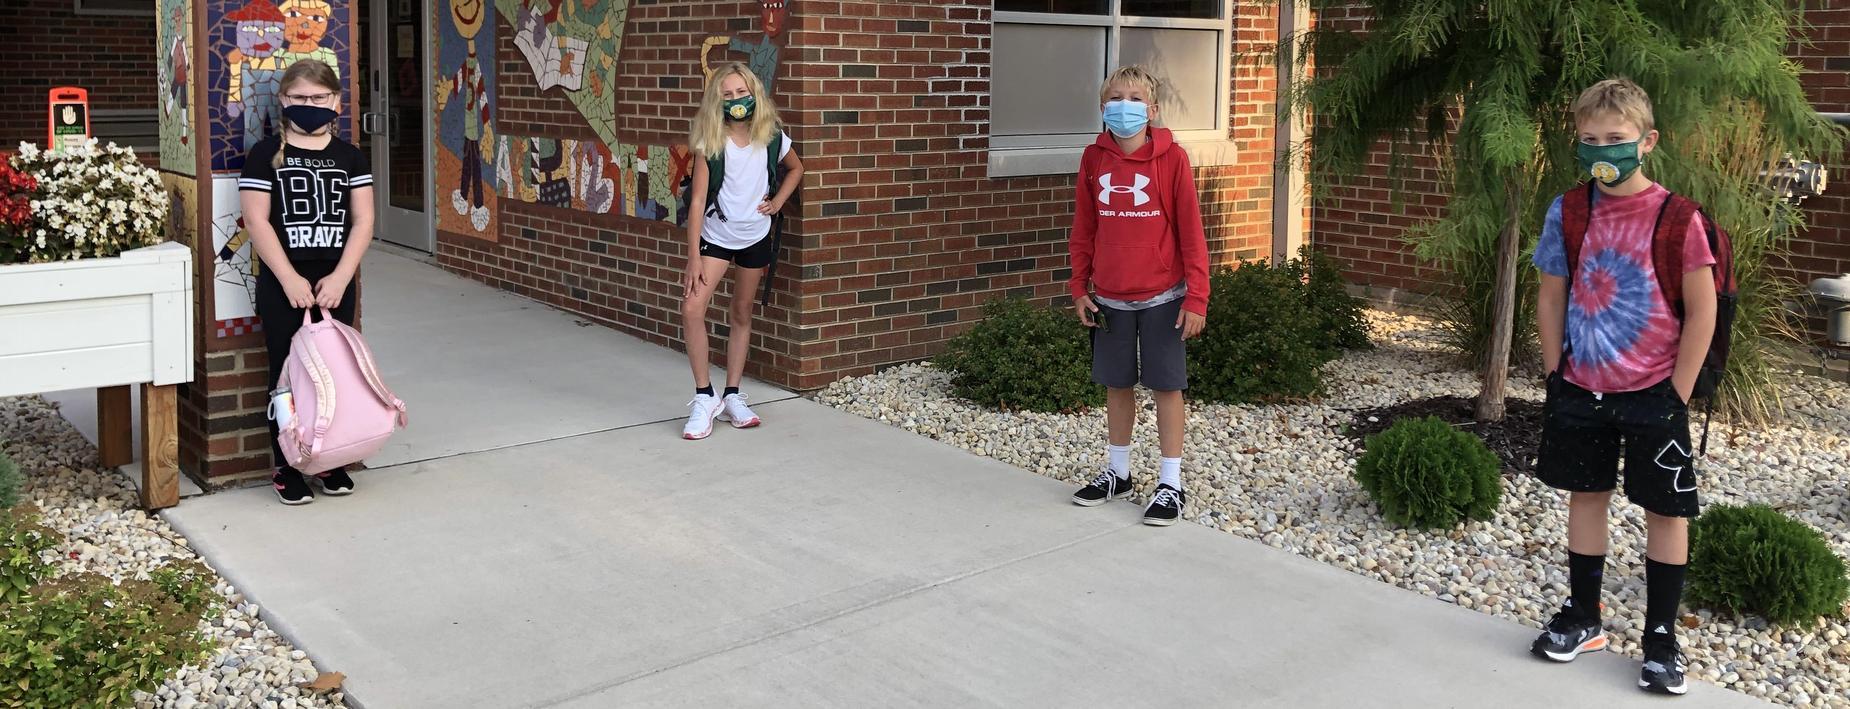 Starting school in the morning